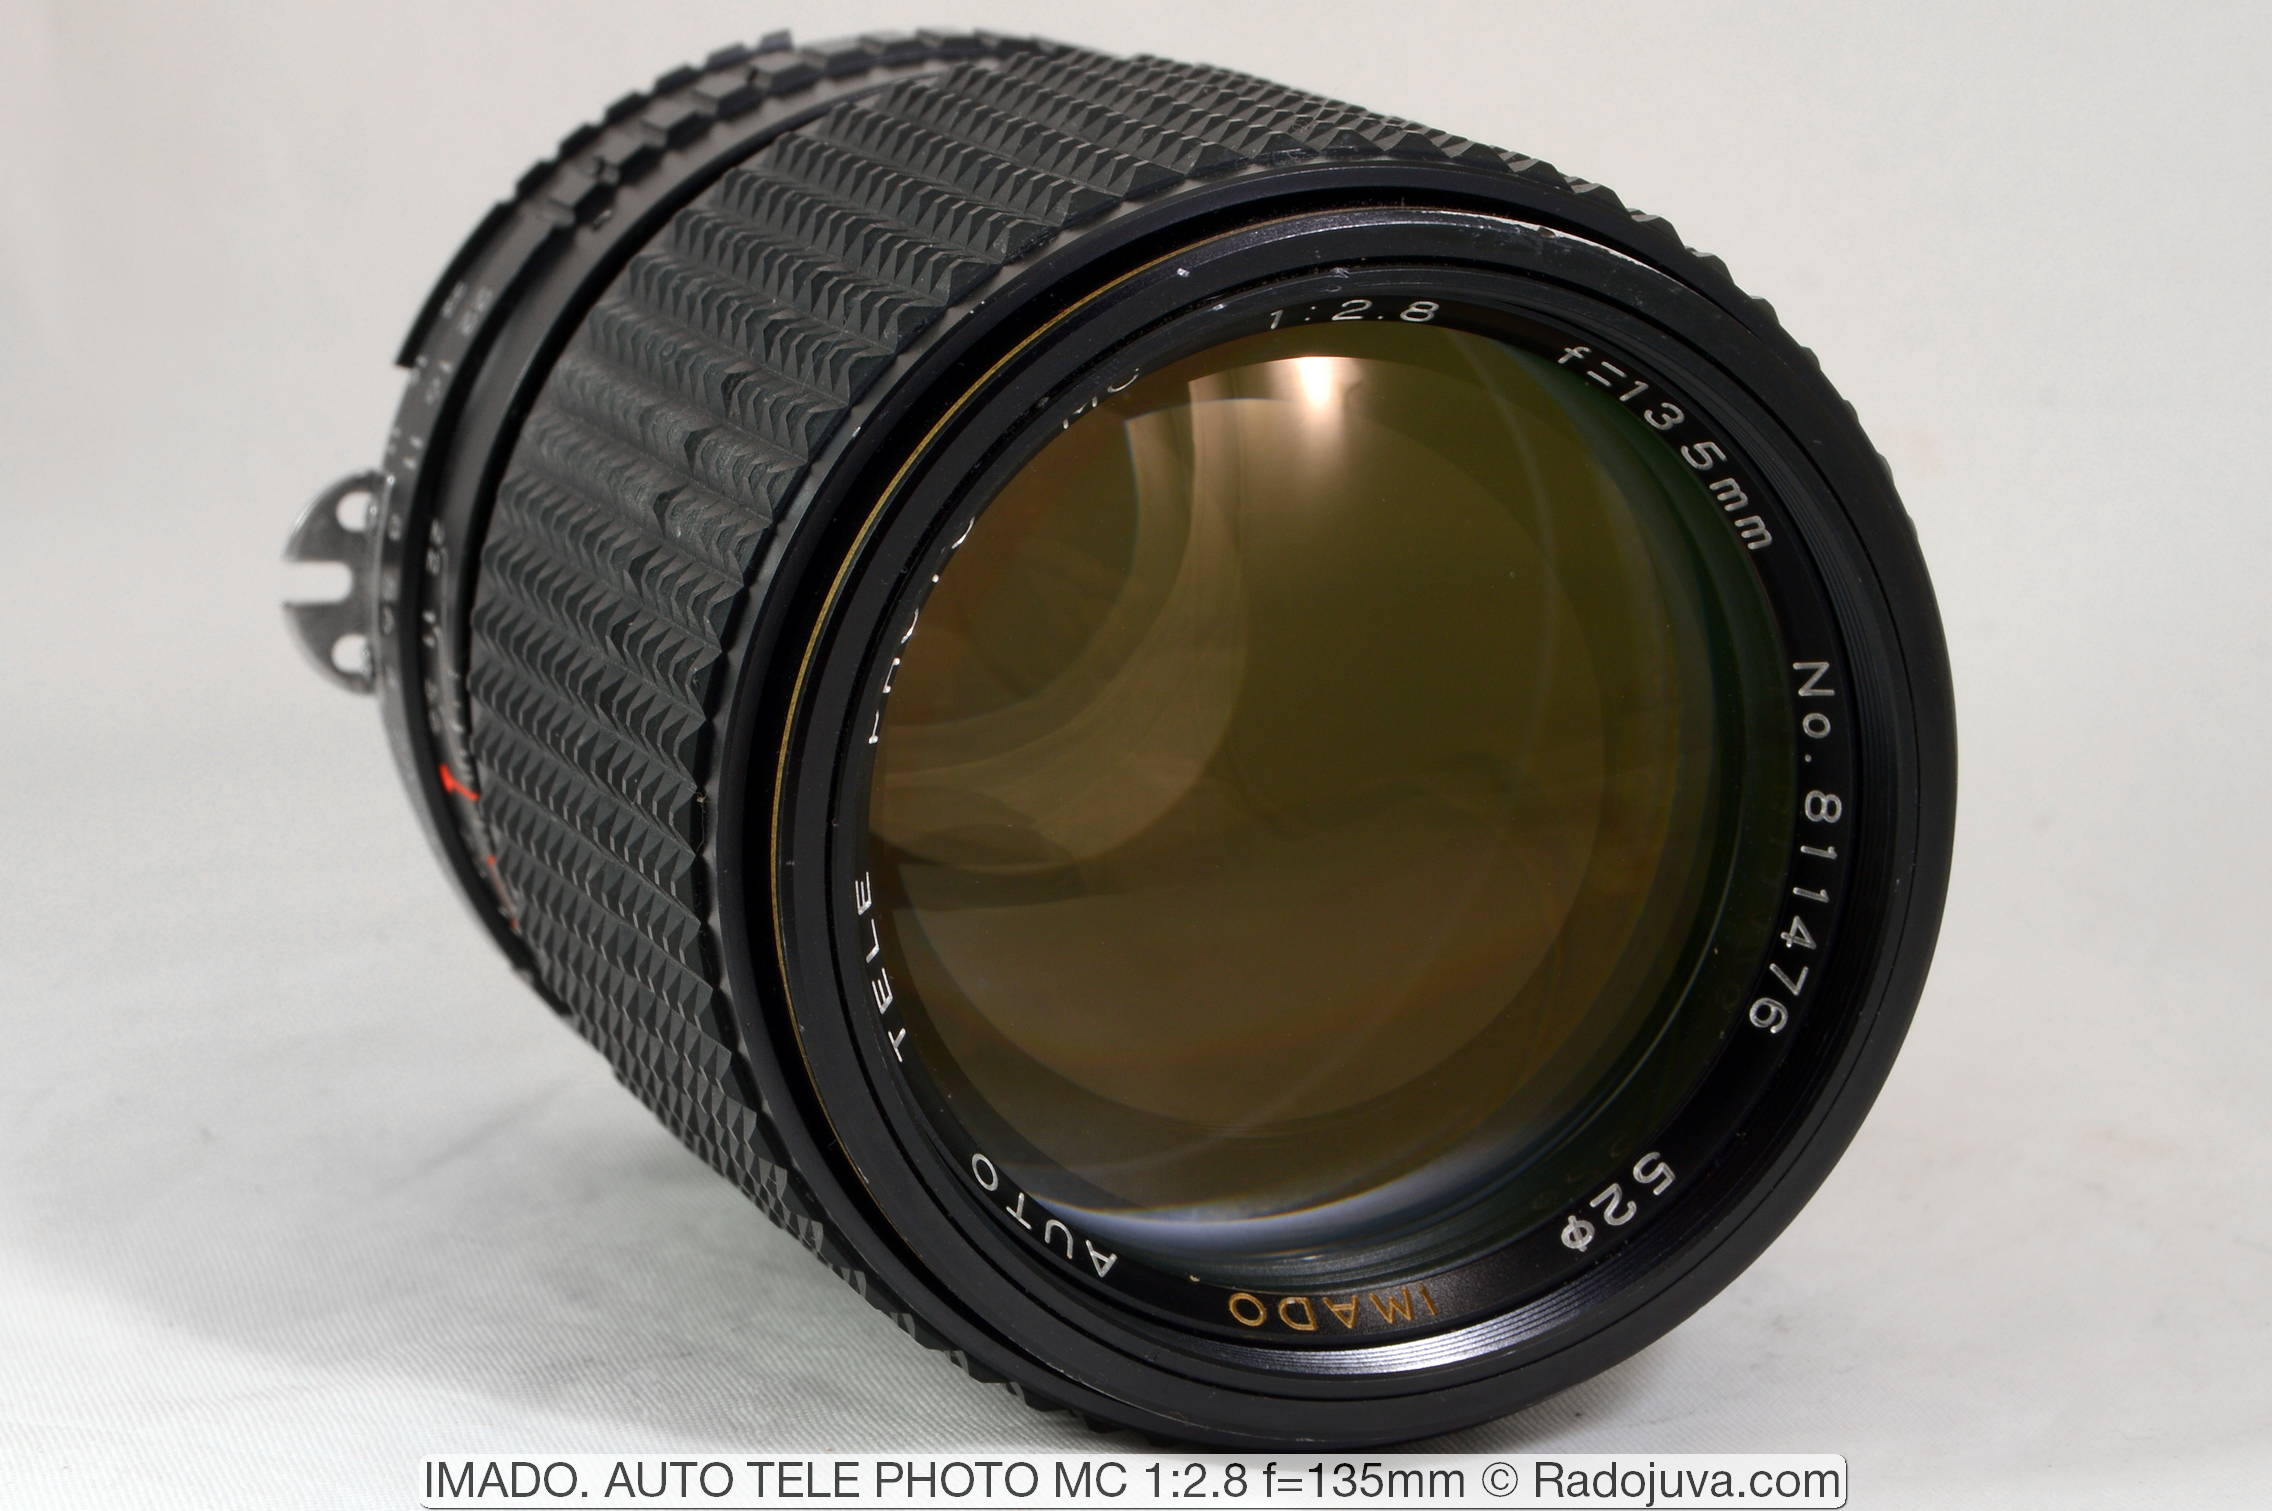 IMADO. AUTO TELE PHOTO MC 1:2.8 f=135mm